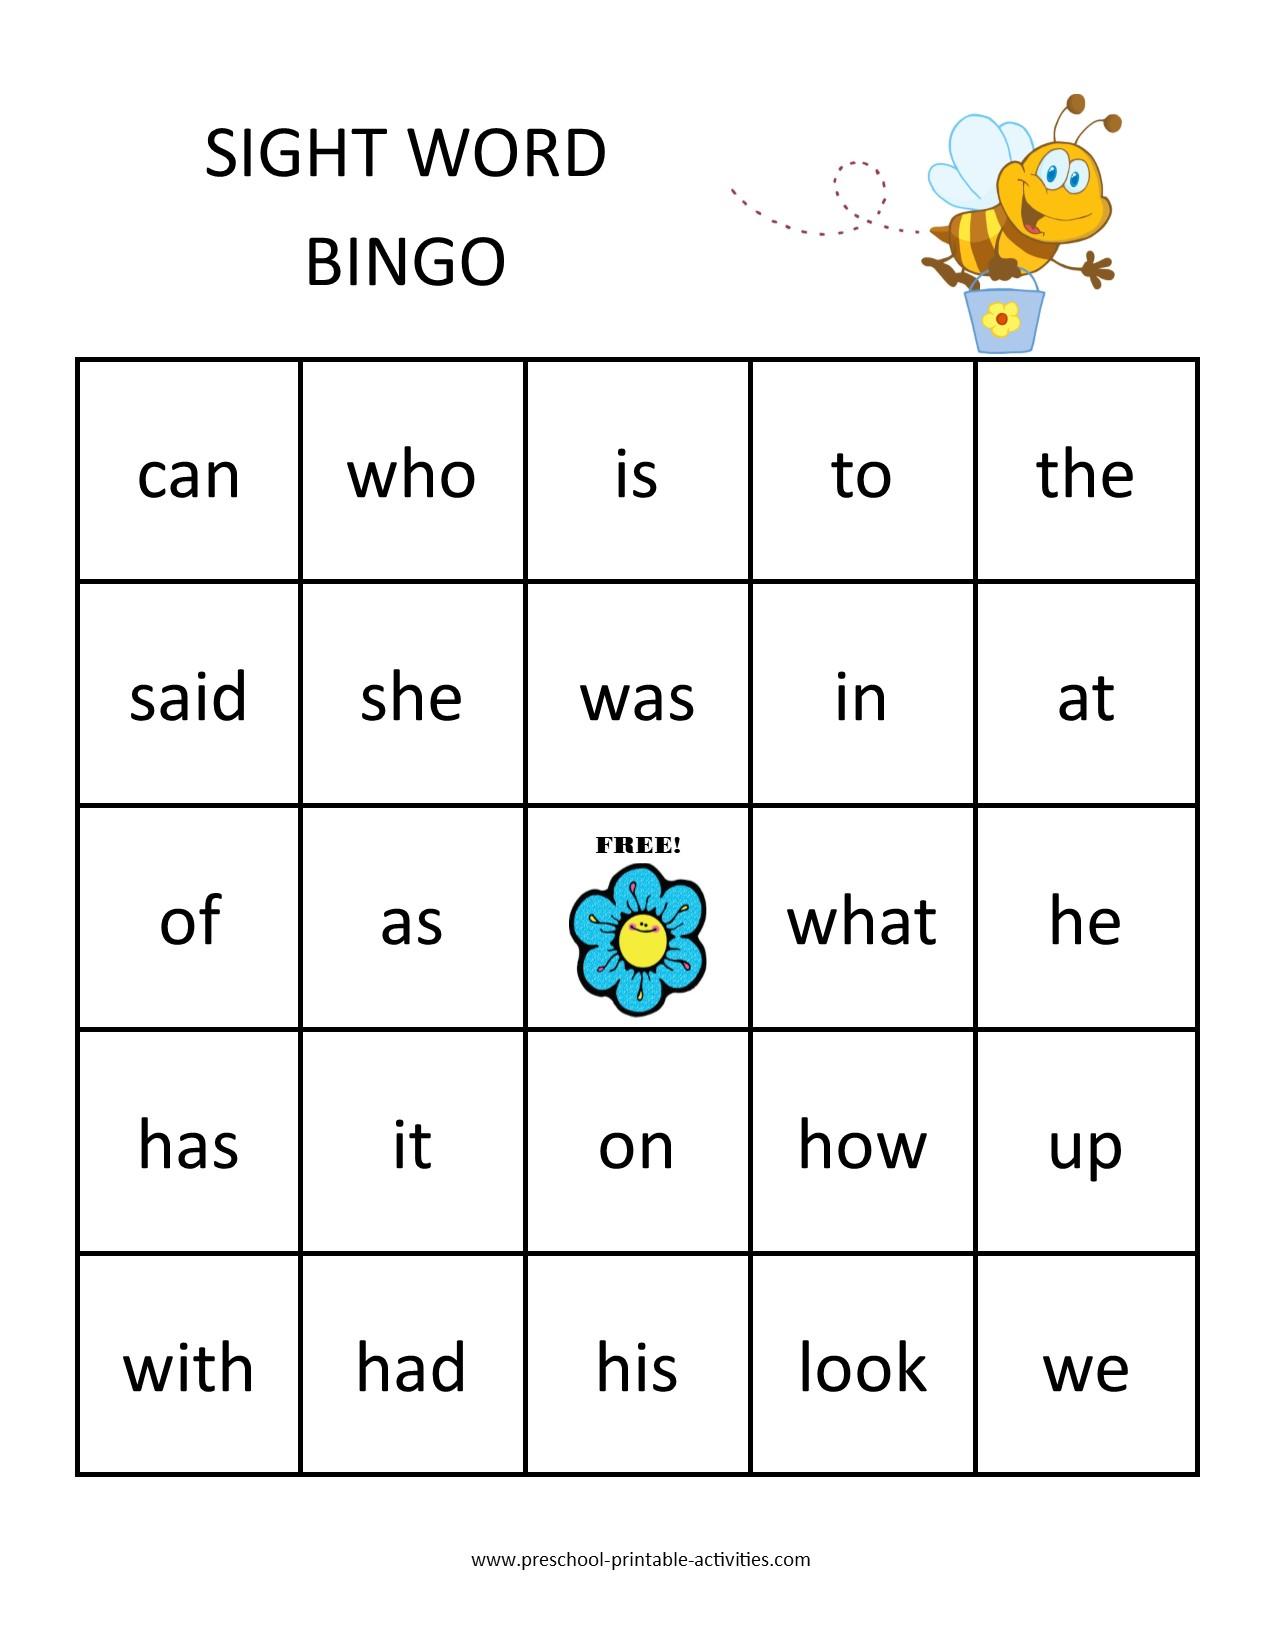 Sight Word Bingo Games